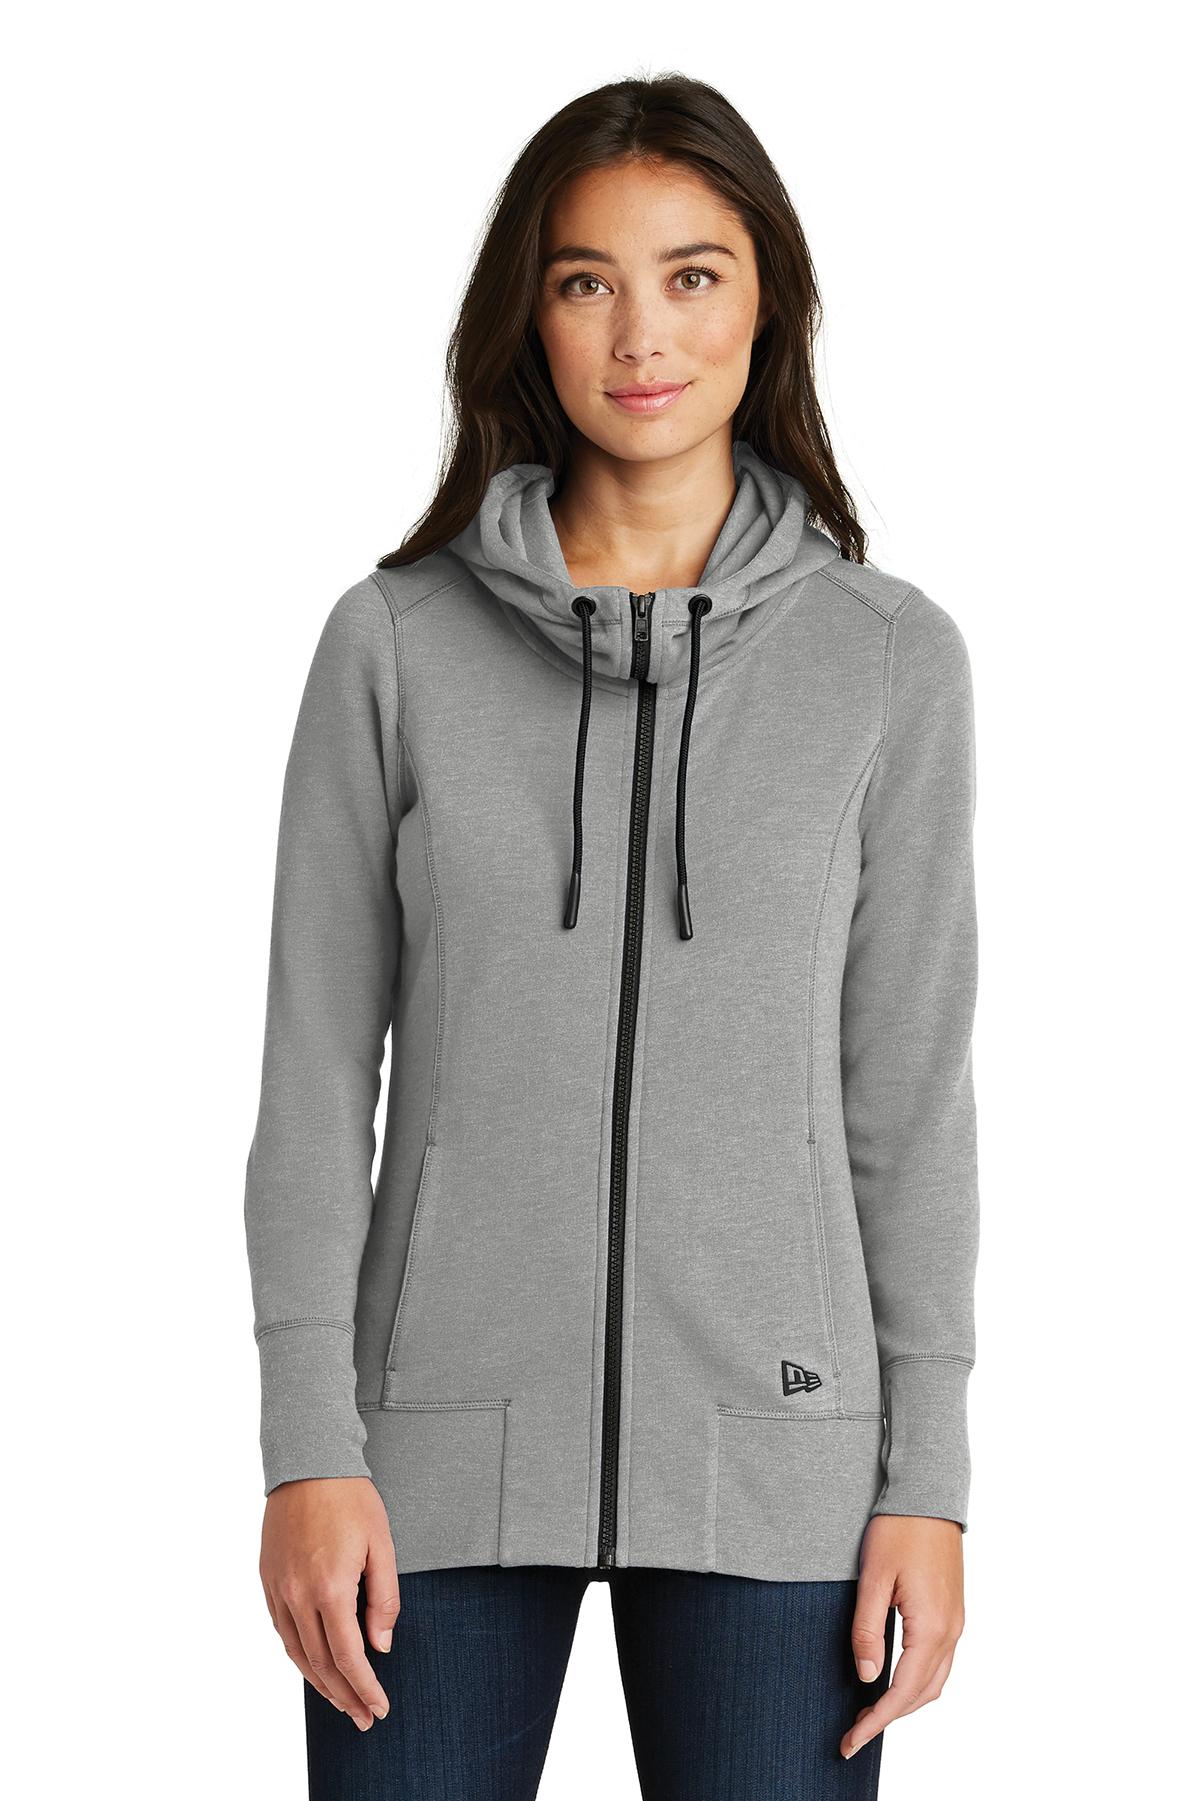 Sweatshirts Blend Ladies New Tri Zip Era® Hoodie Fleece Full ROw8OF7q